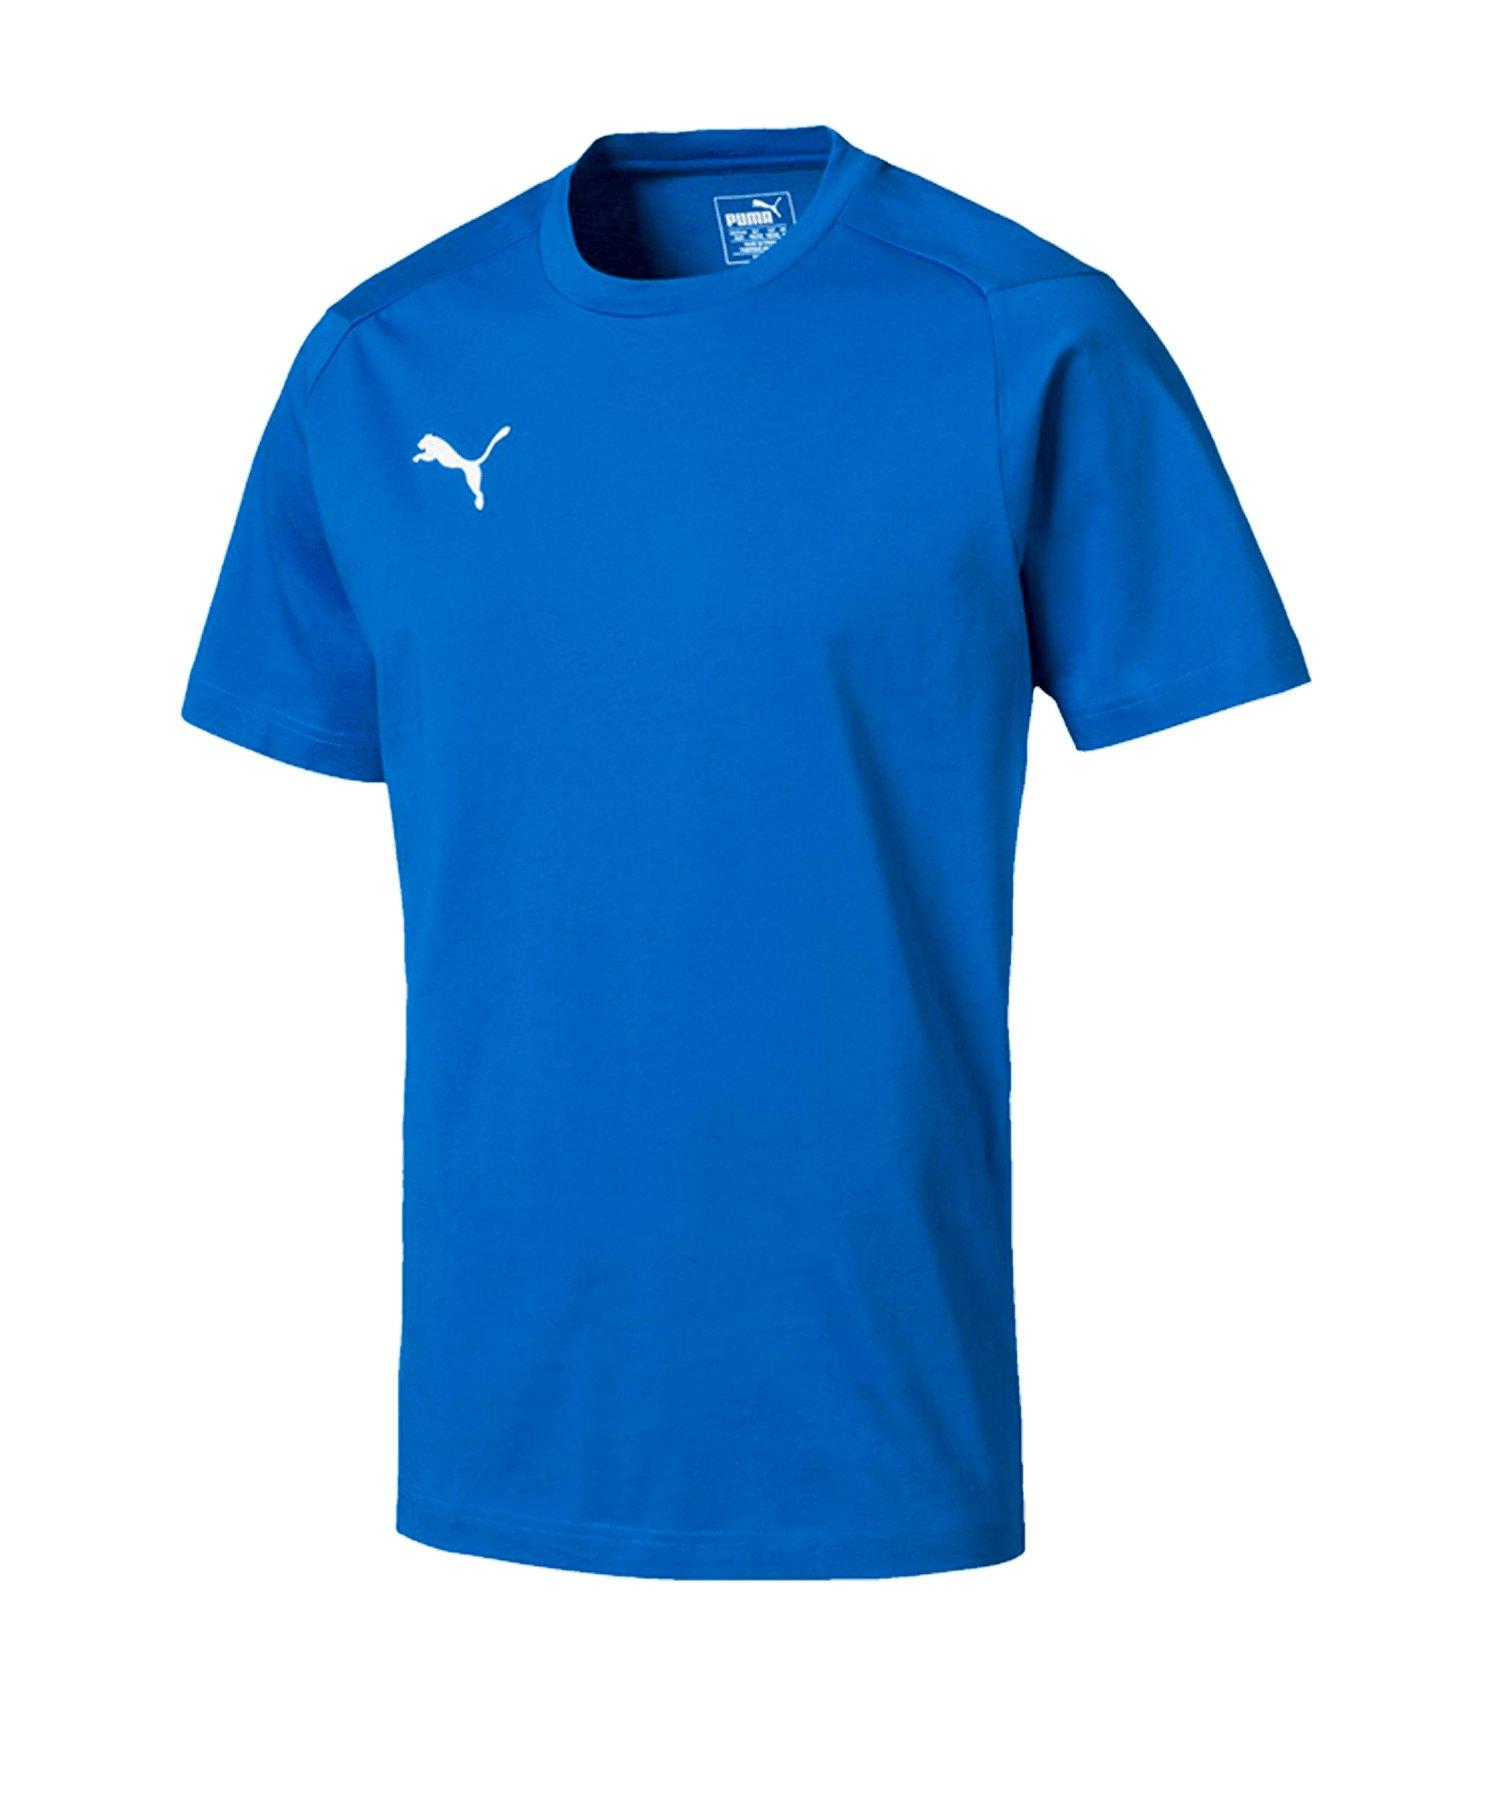 PUMA LIGA Casuals Tee T-Shirt Blau F02 - blau